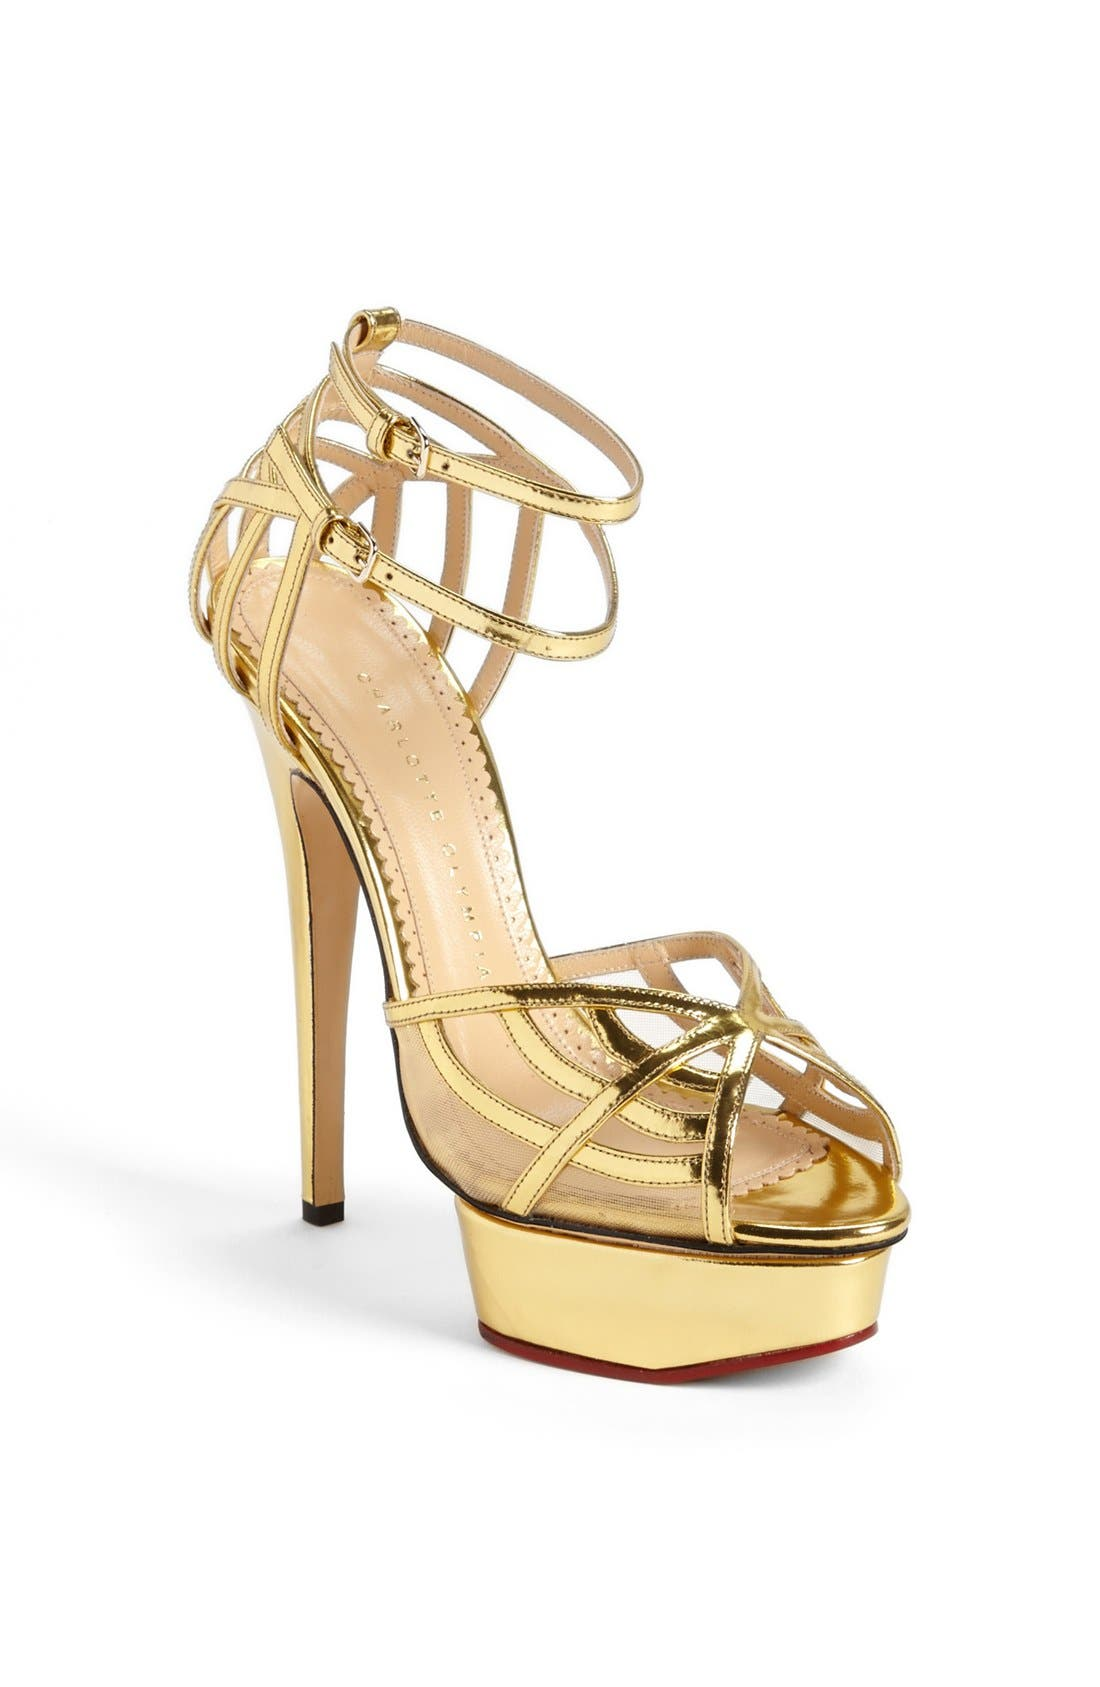 Main Image - Charlotte Olympia 'Octavia' Sandal